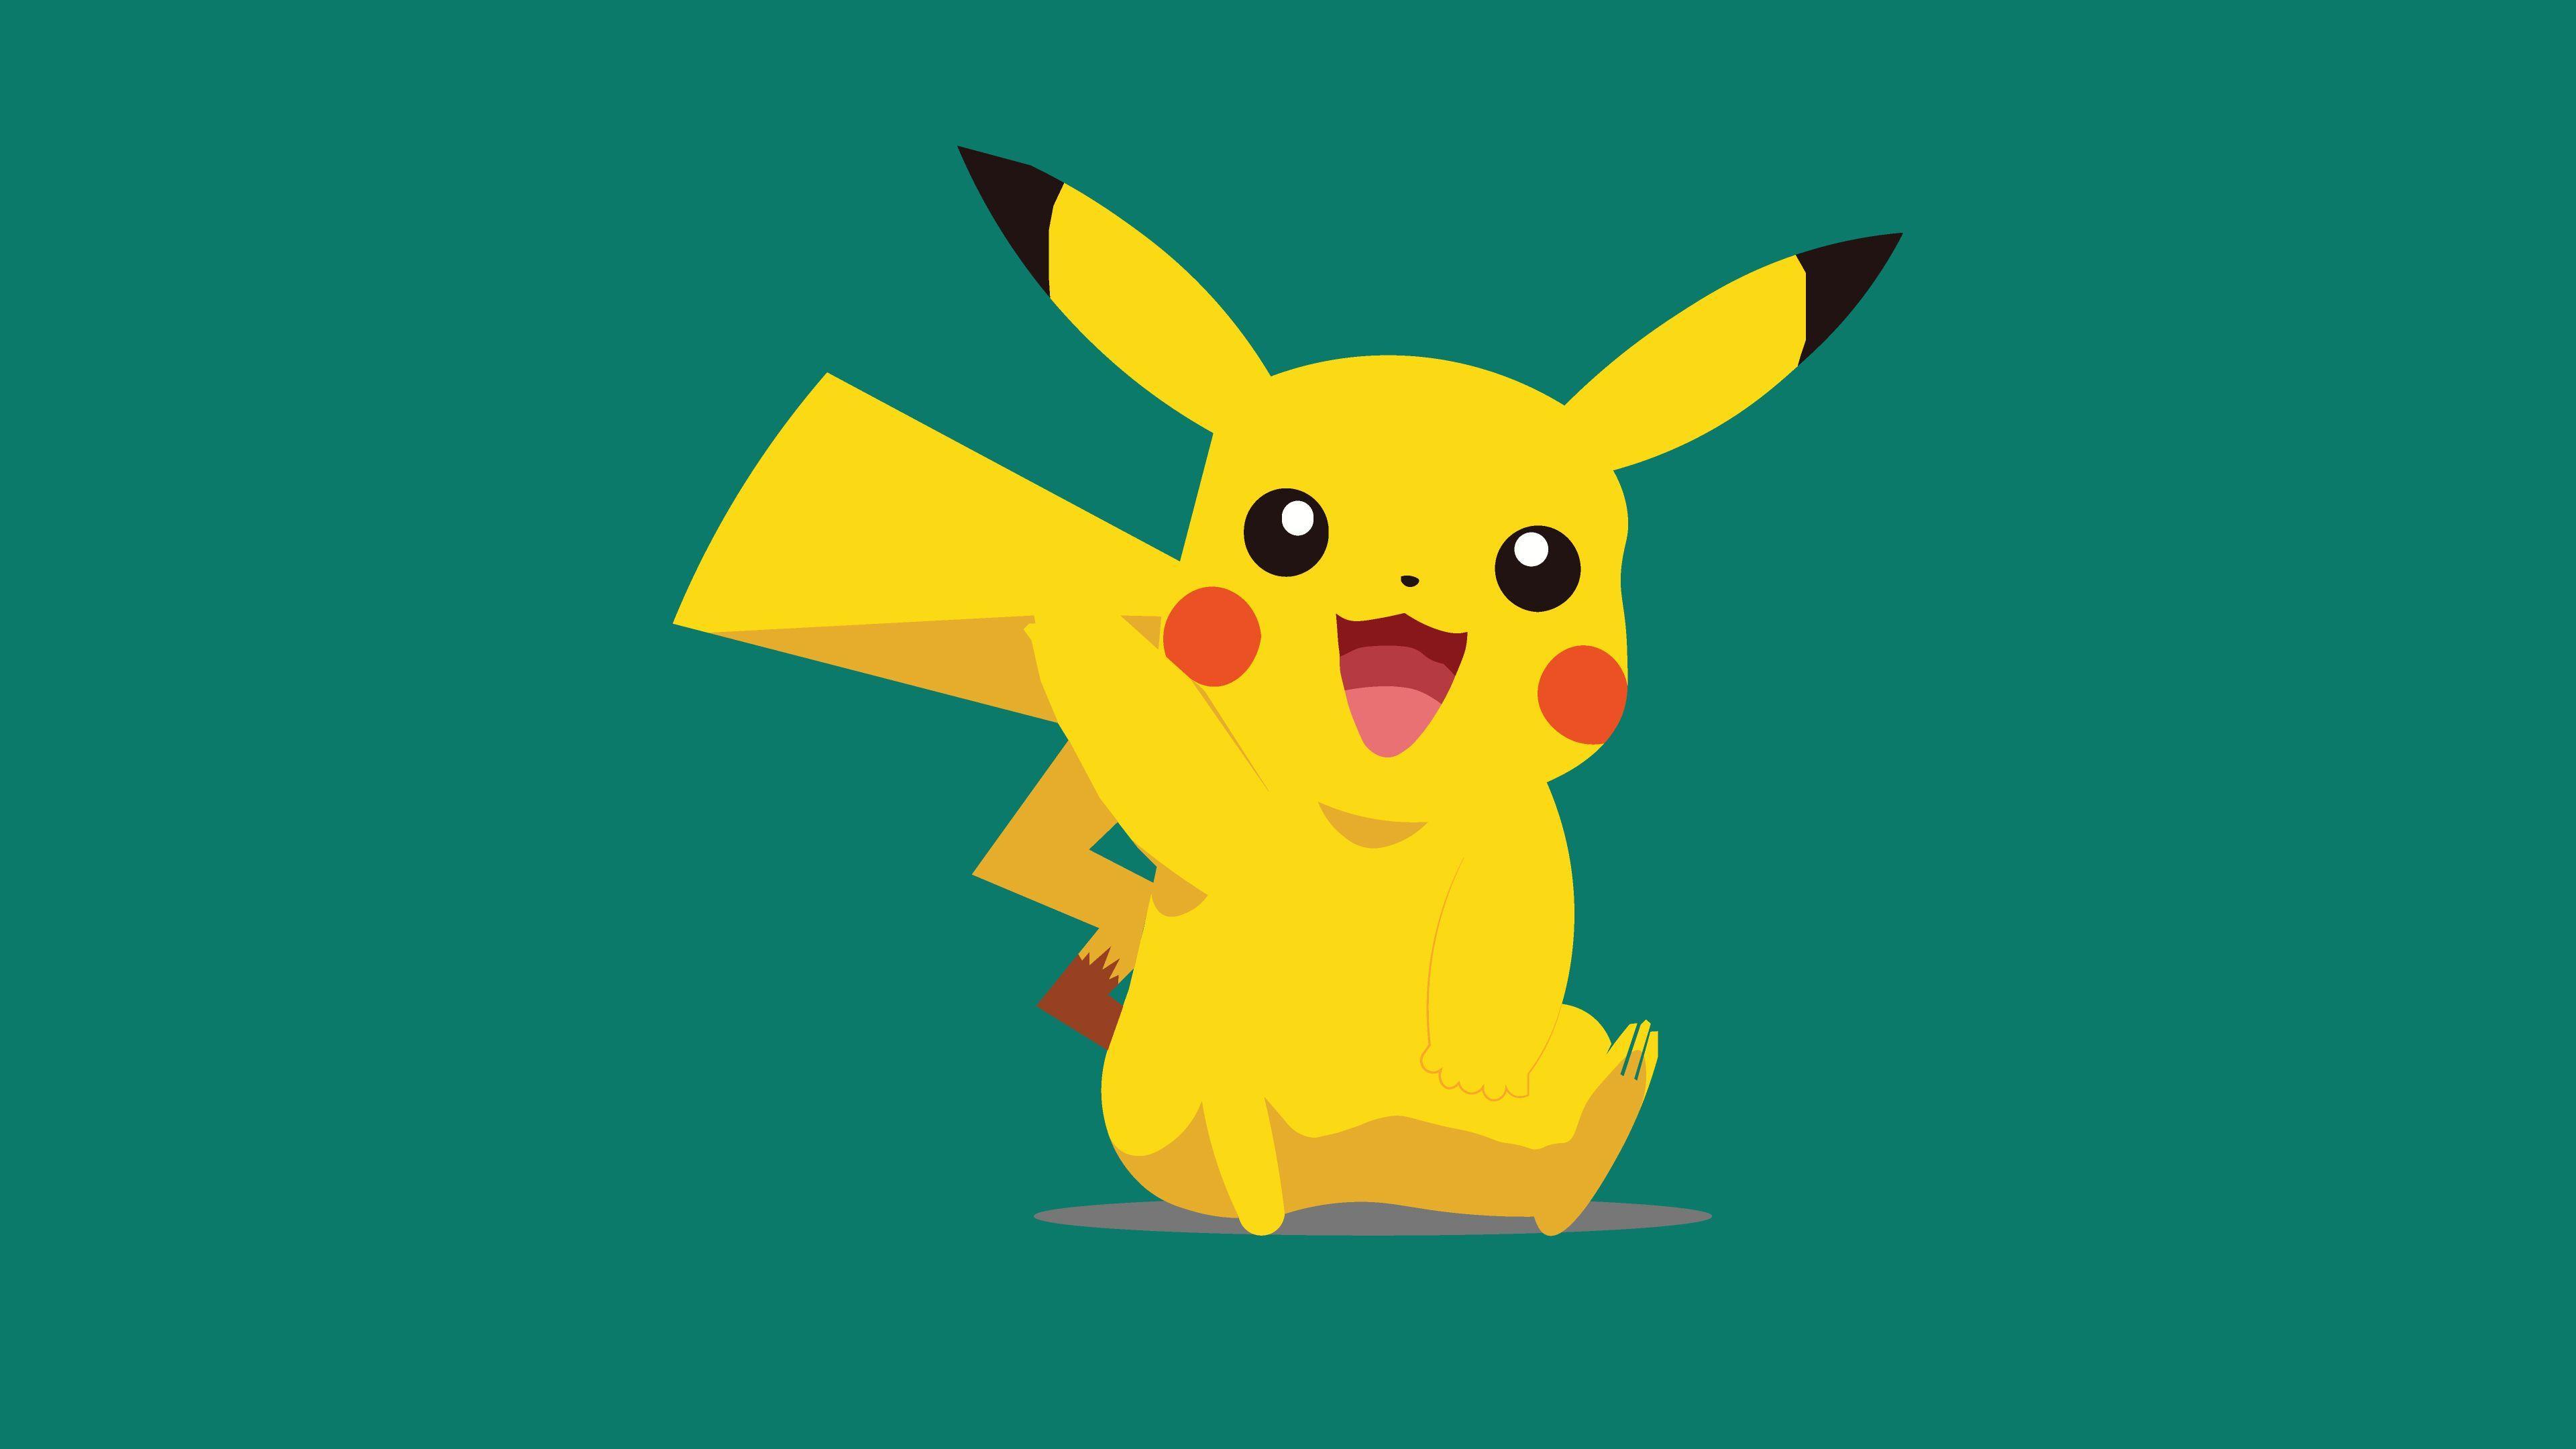 Pikachu Laptop Wallpapers - Top Free Pikachu Laptop ...